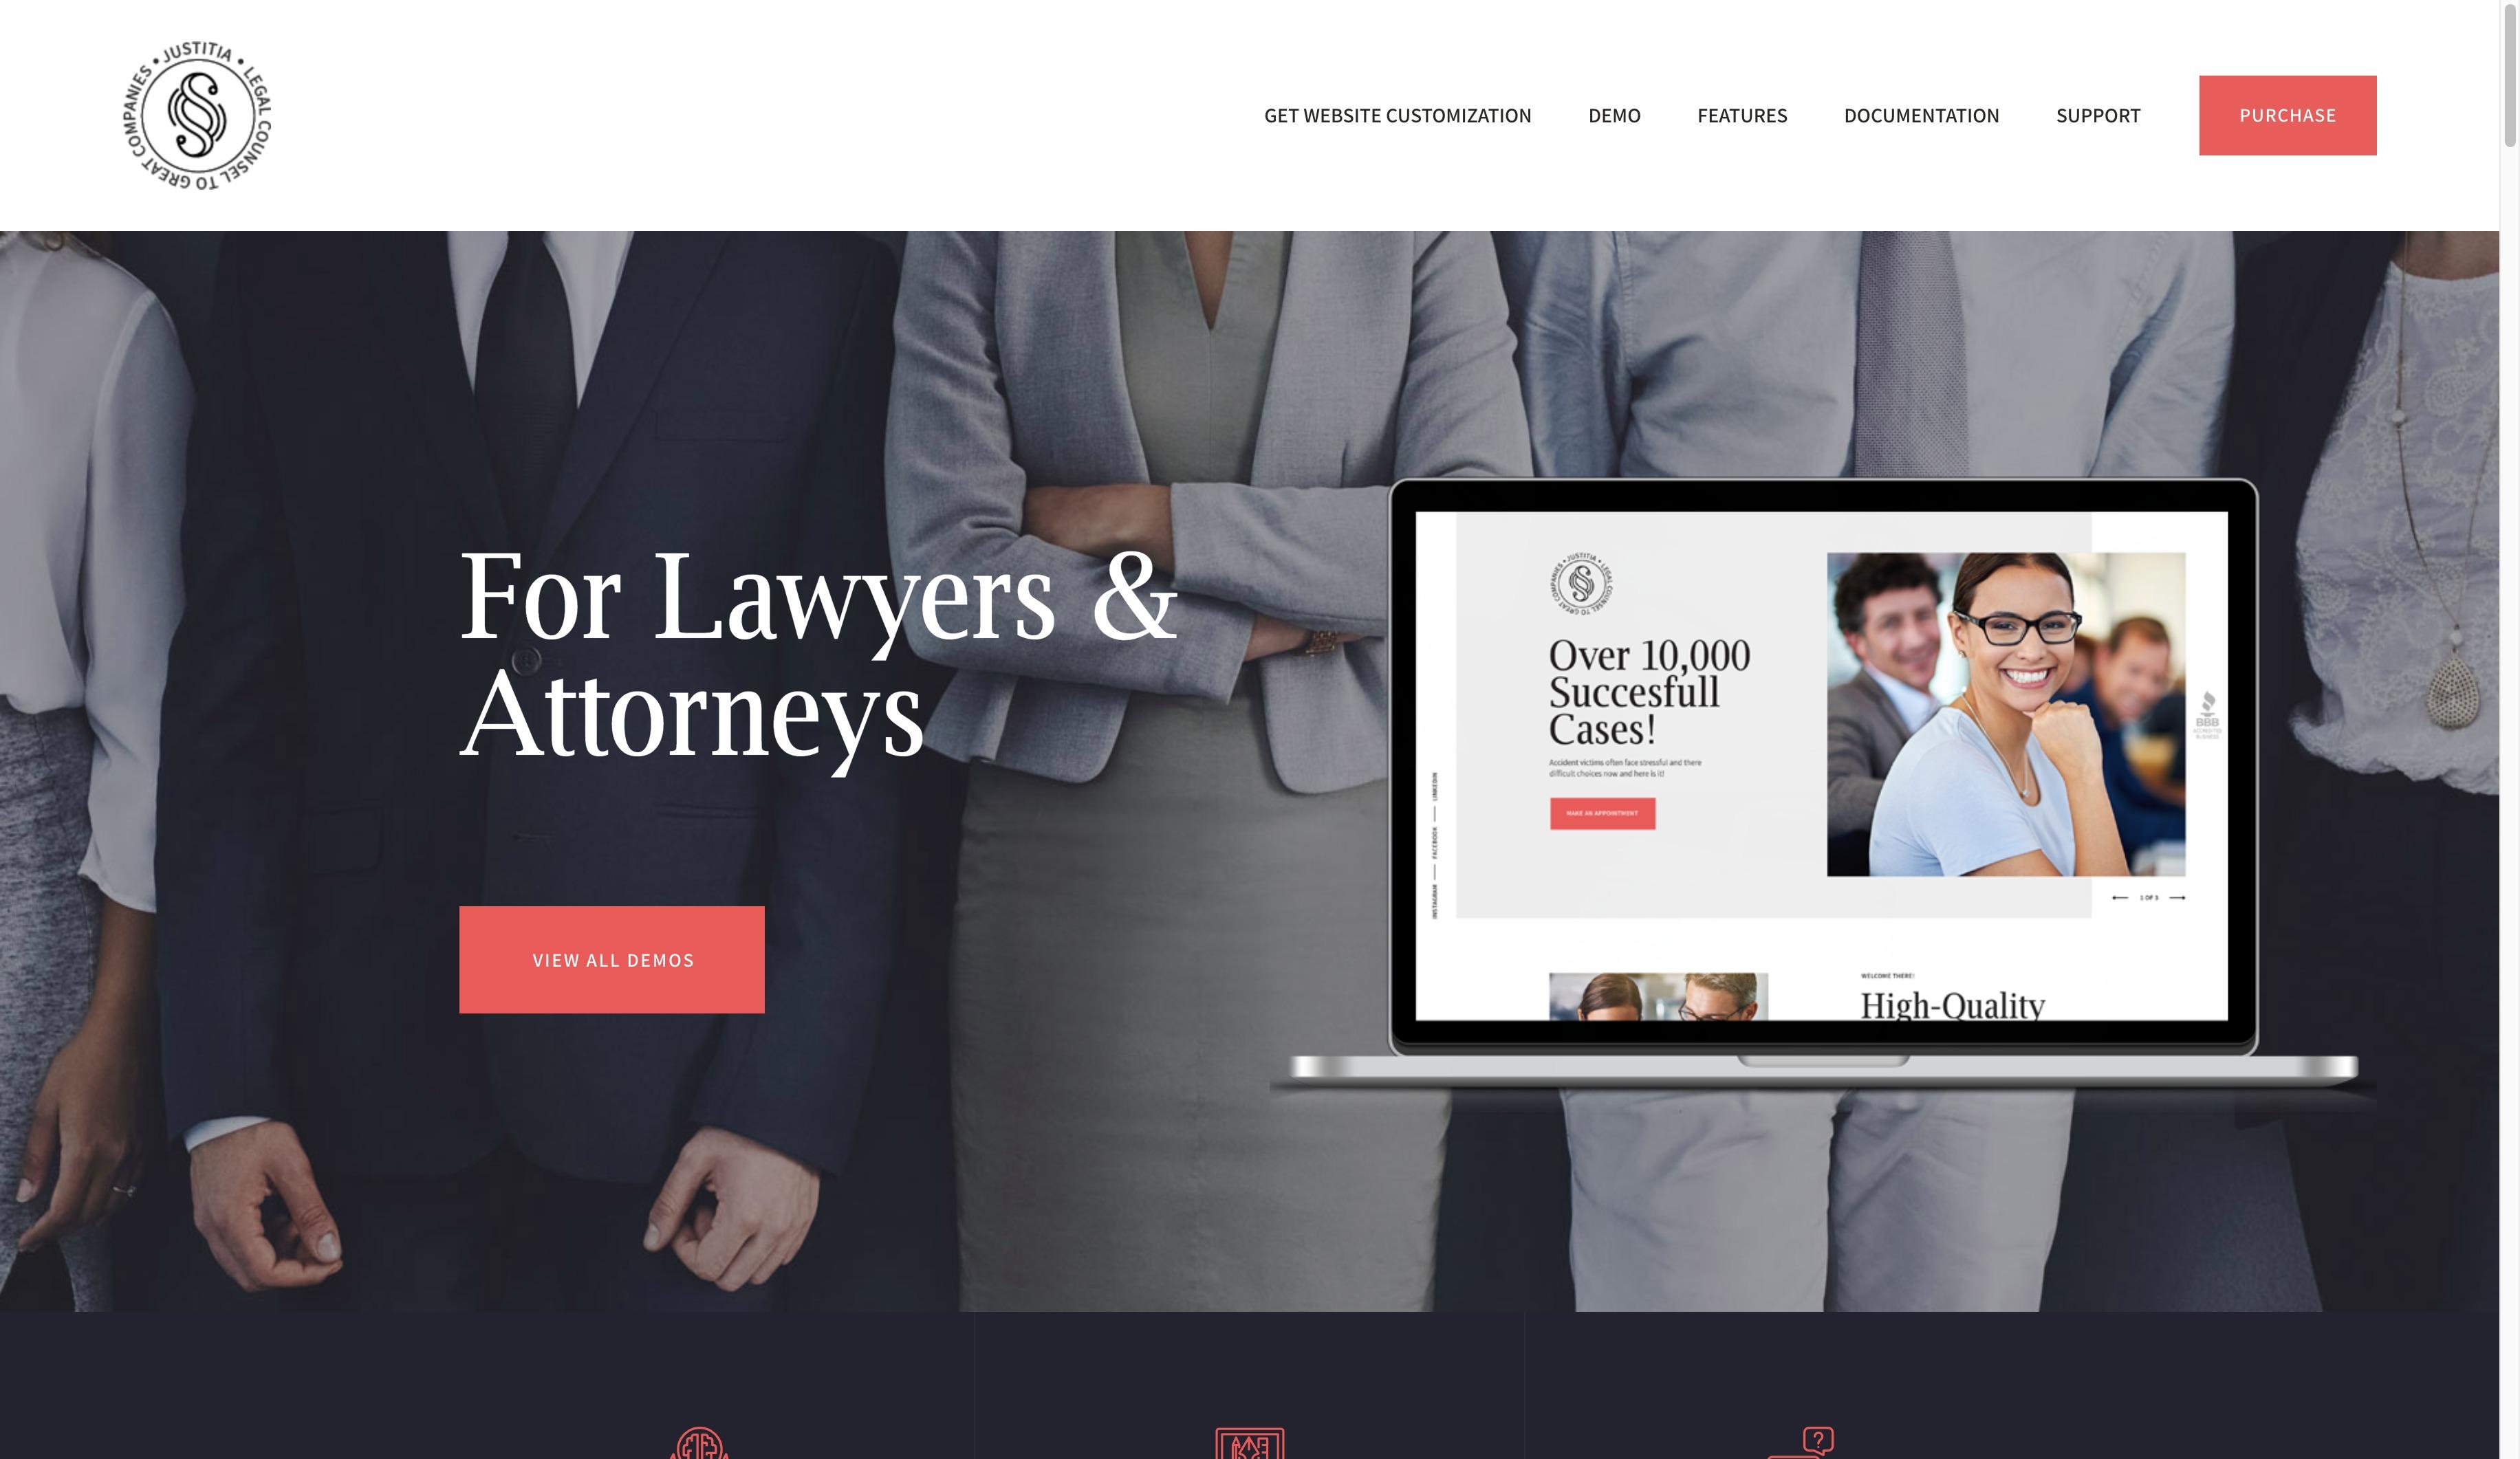 Justitia-律师事务所法律顾问WordPress主题